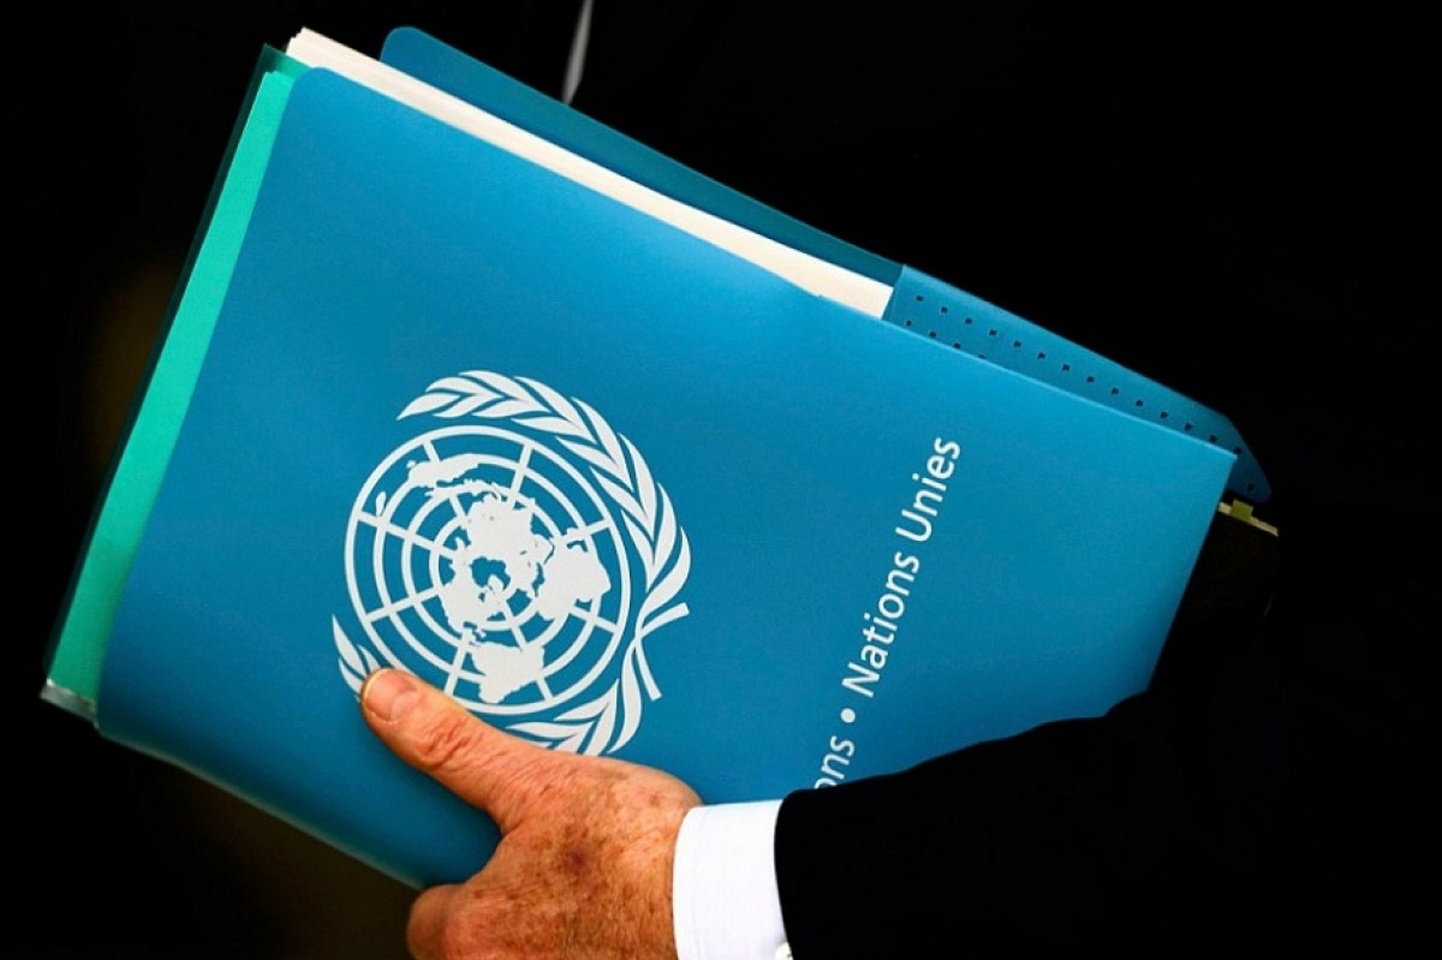 На Генассамблее ООН будут дебаты по ситуации в Крыму и на Донбассе